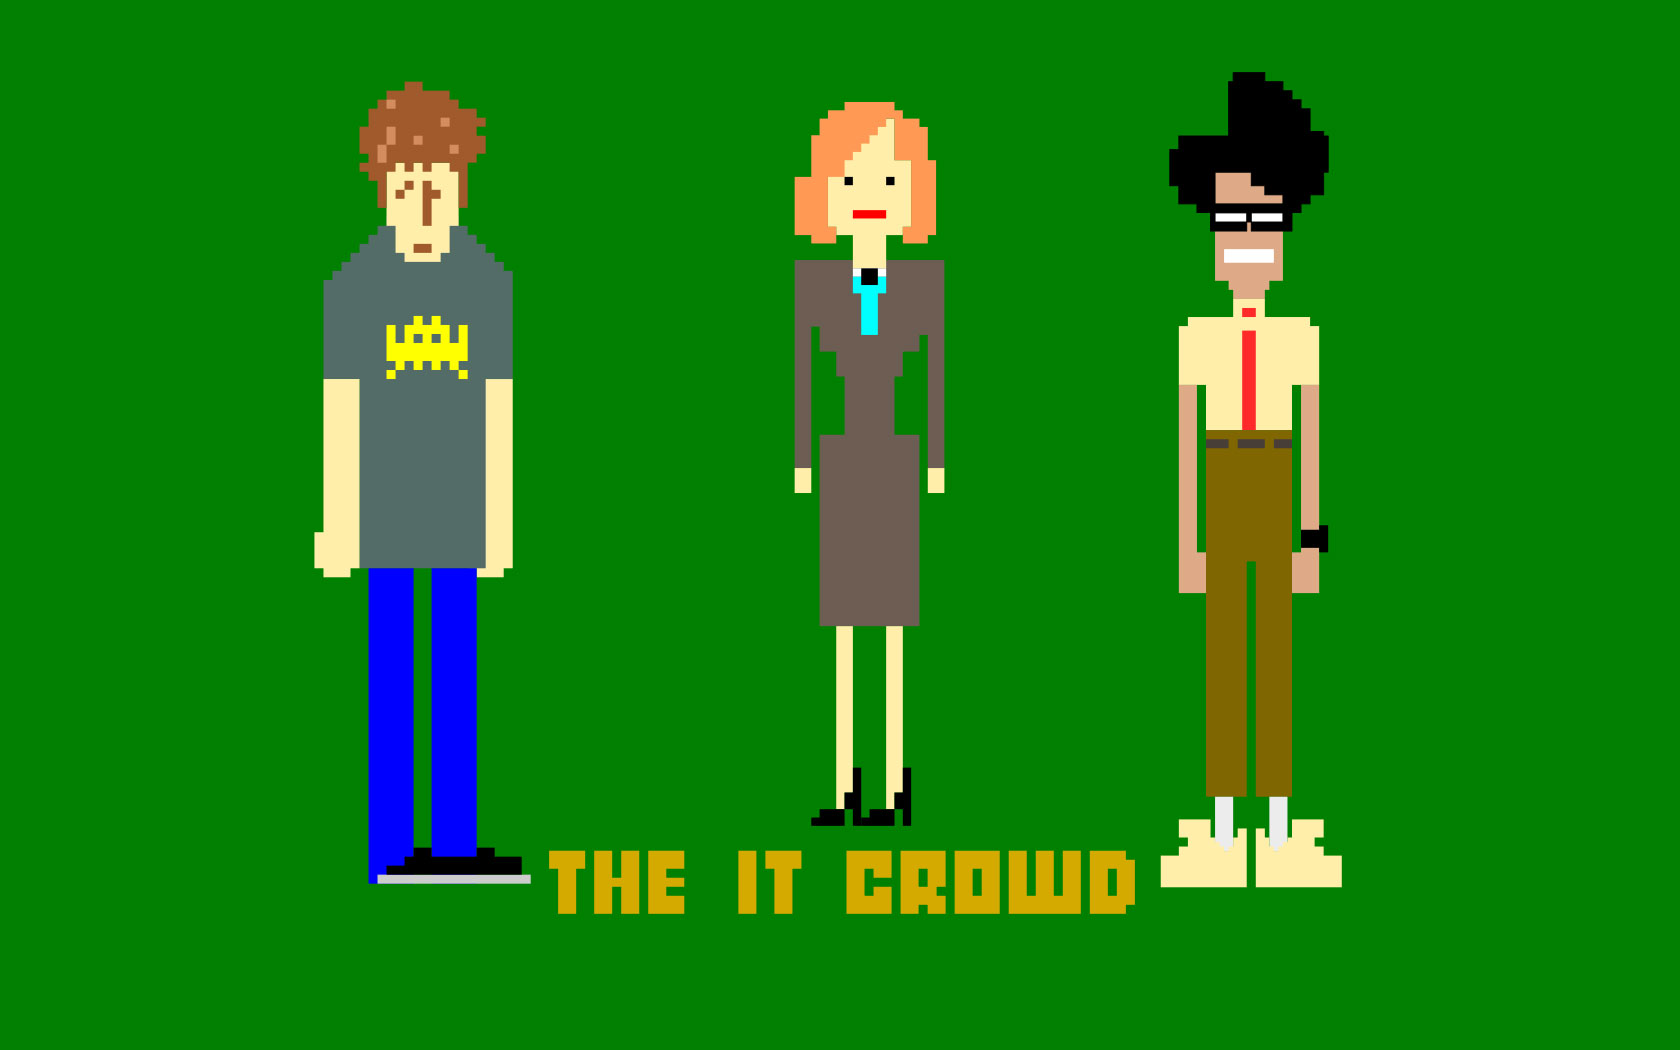 the-it-crowd.jpg